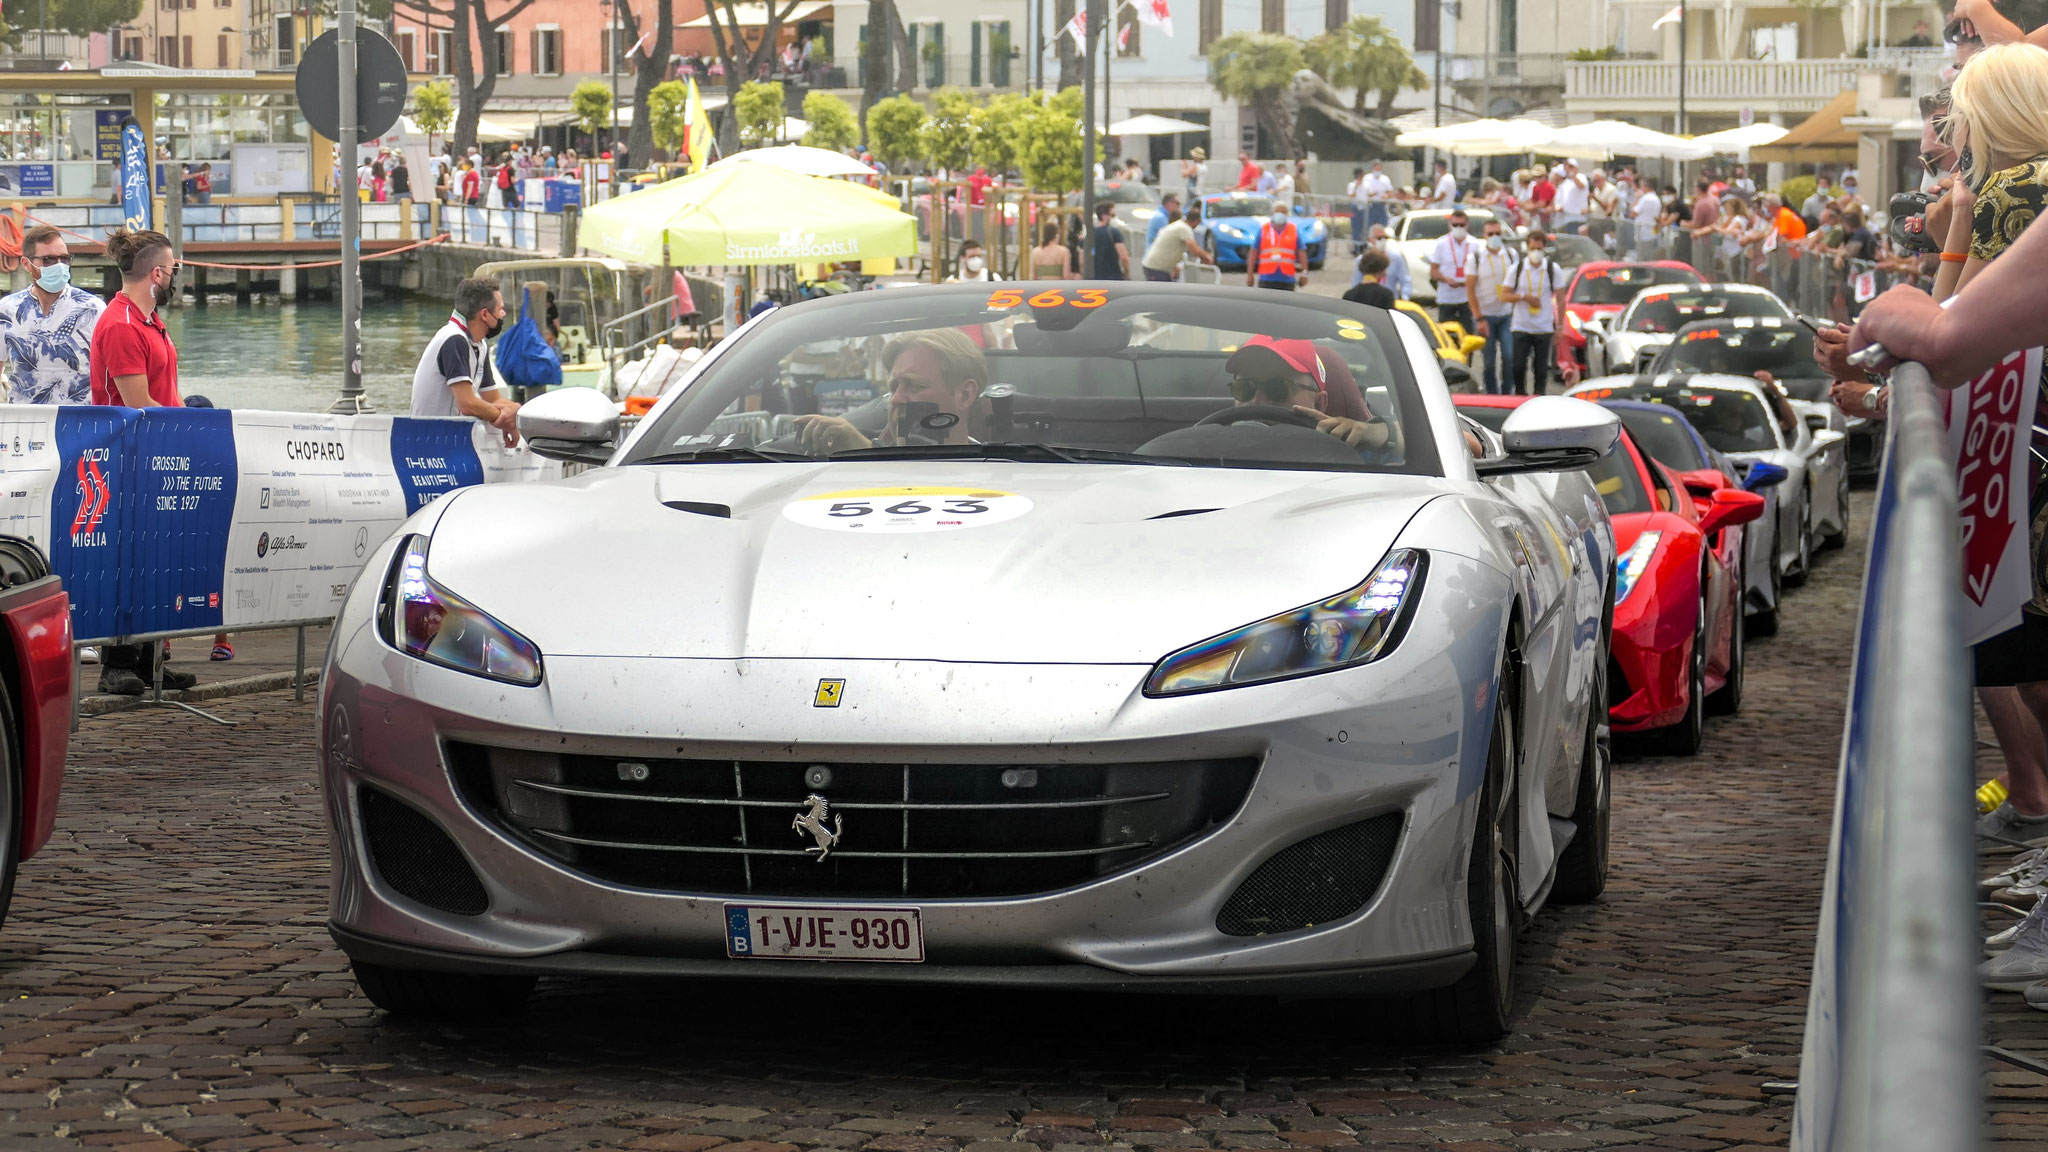 Ferrari Portofino - 1-VJE-930 (BEL)